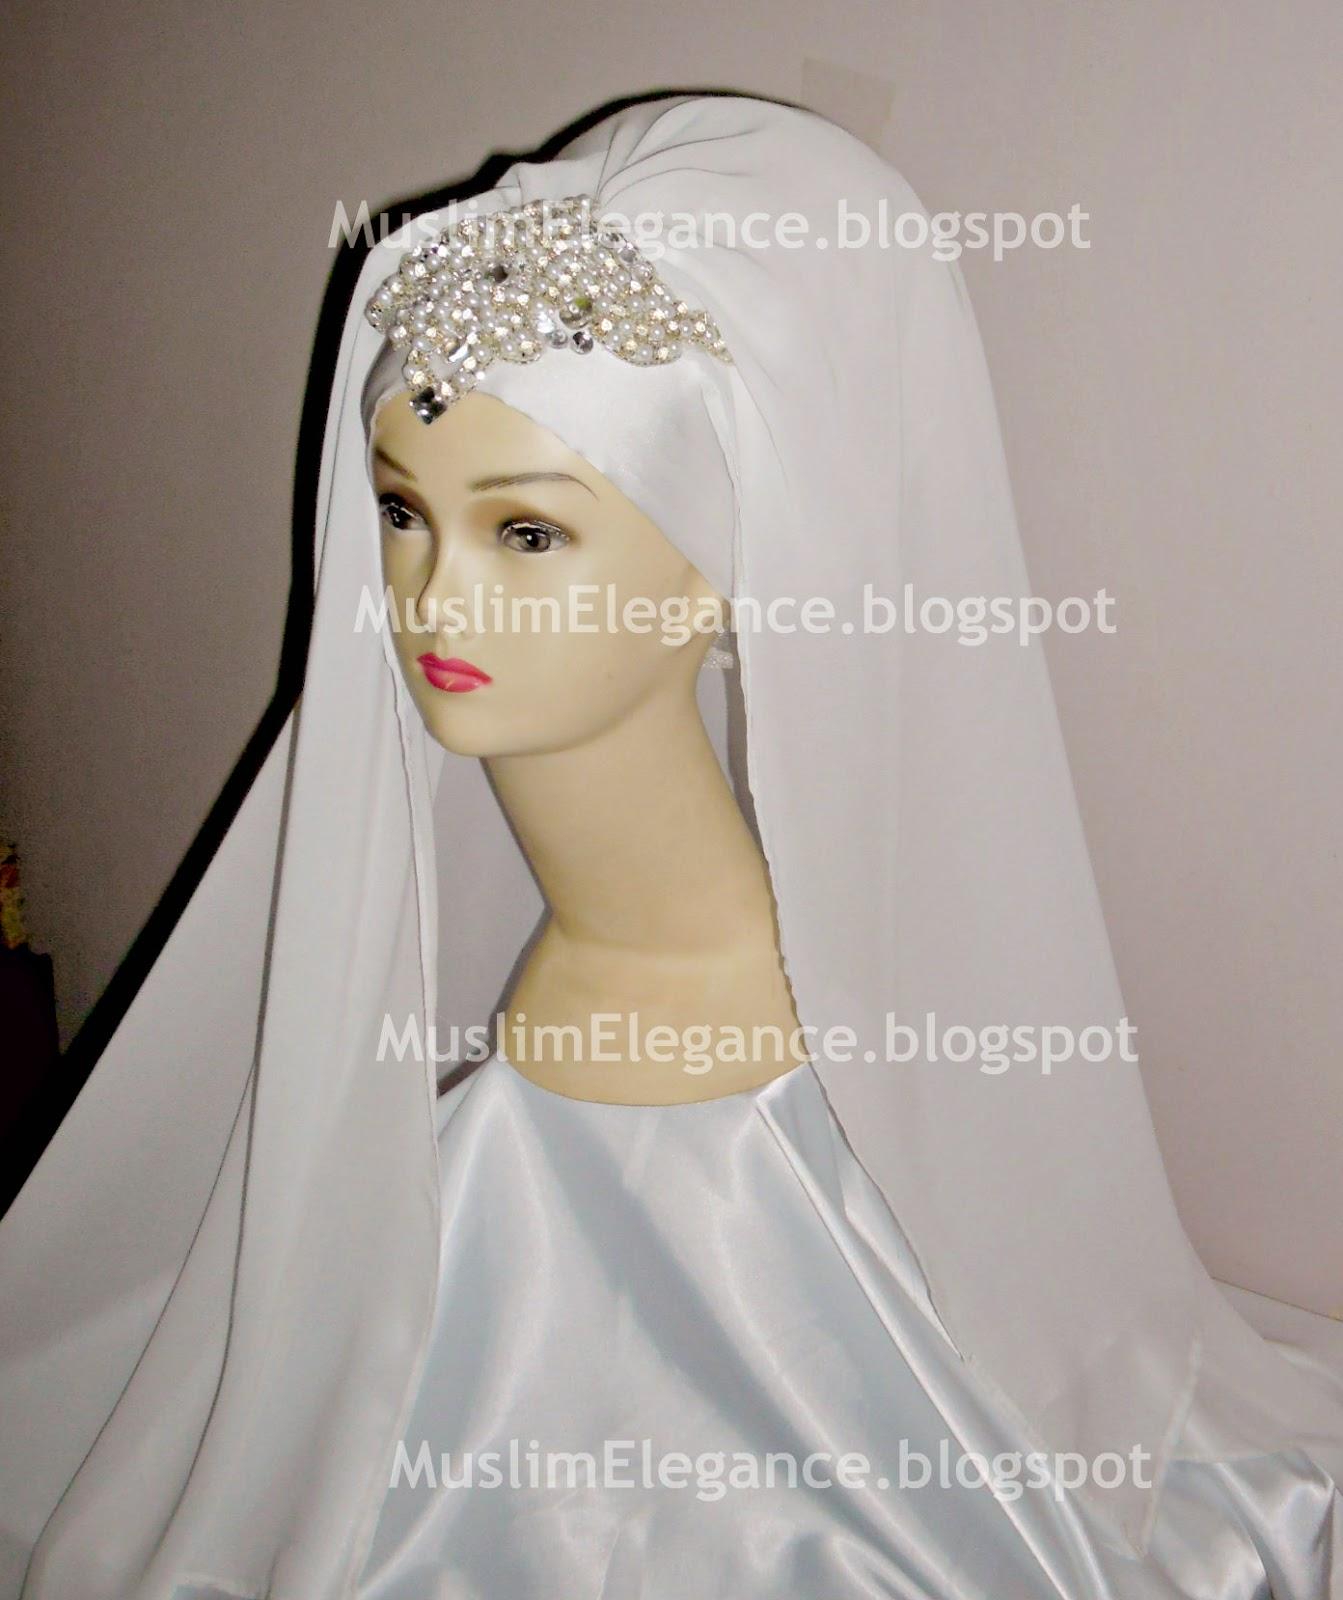 Bridal Hijab Muslim Elegance Headpiece